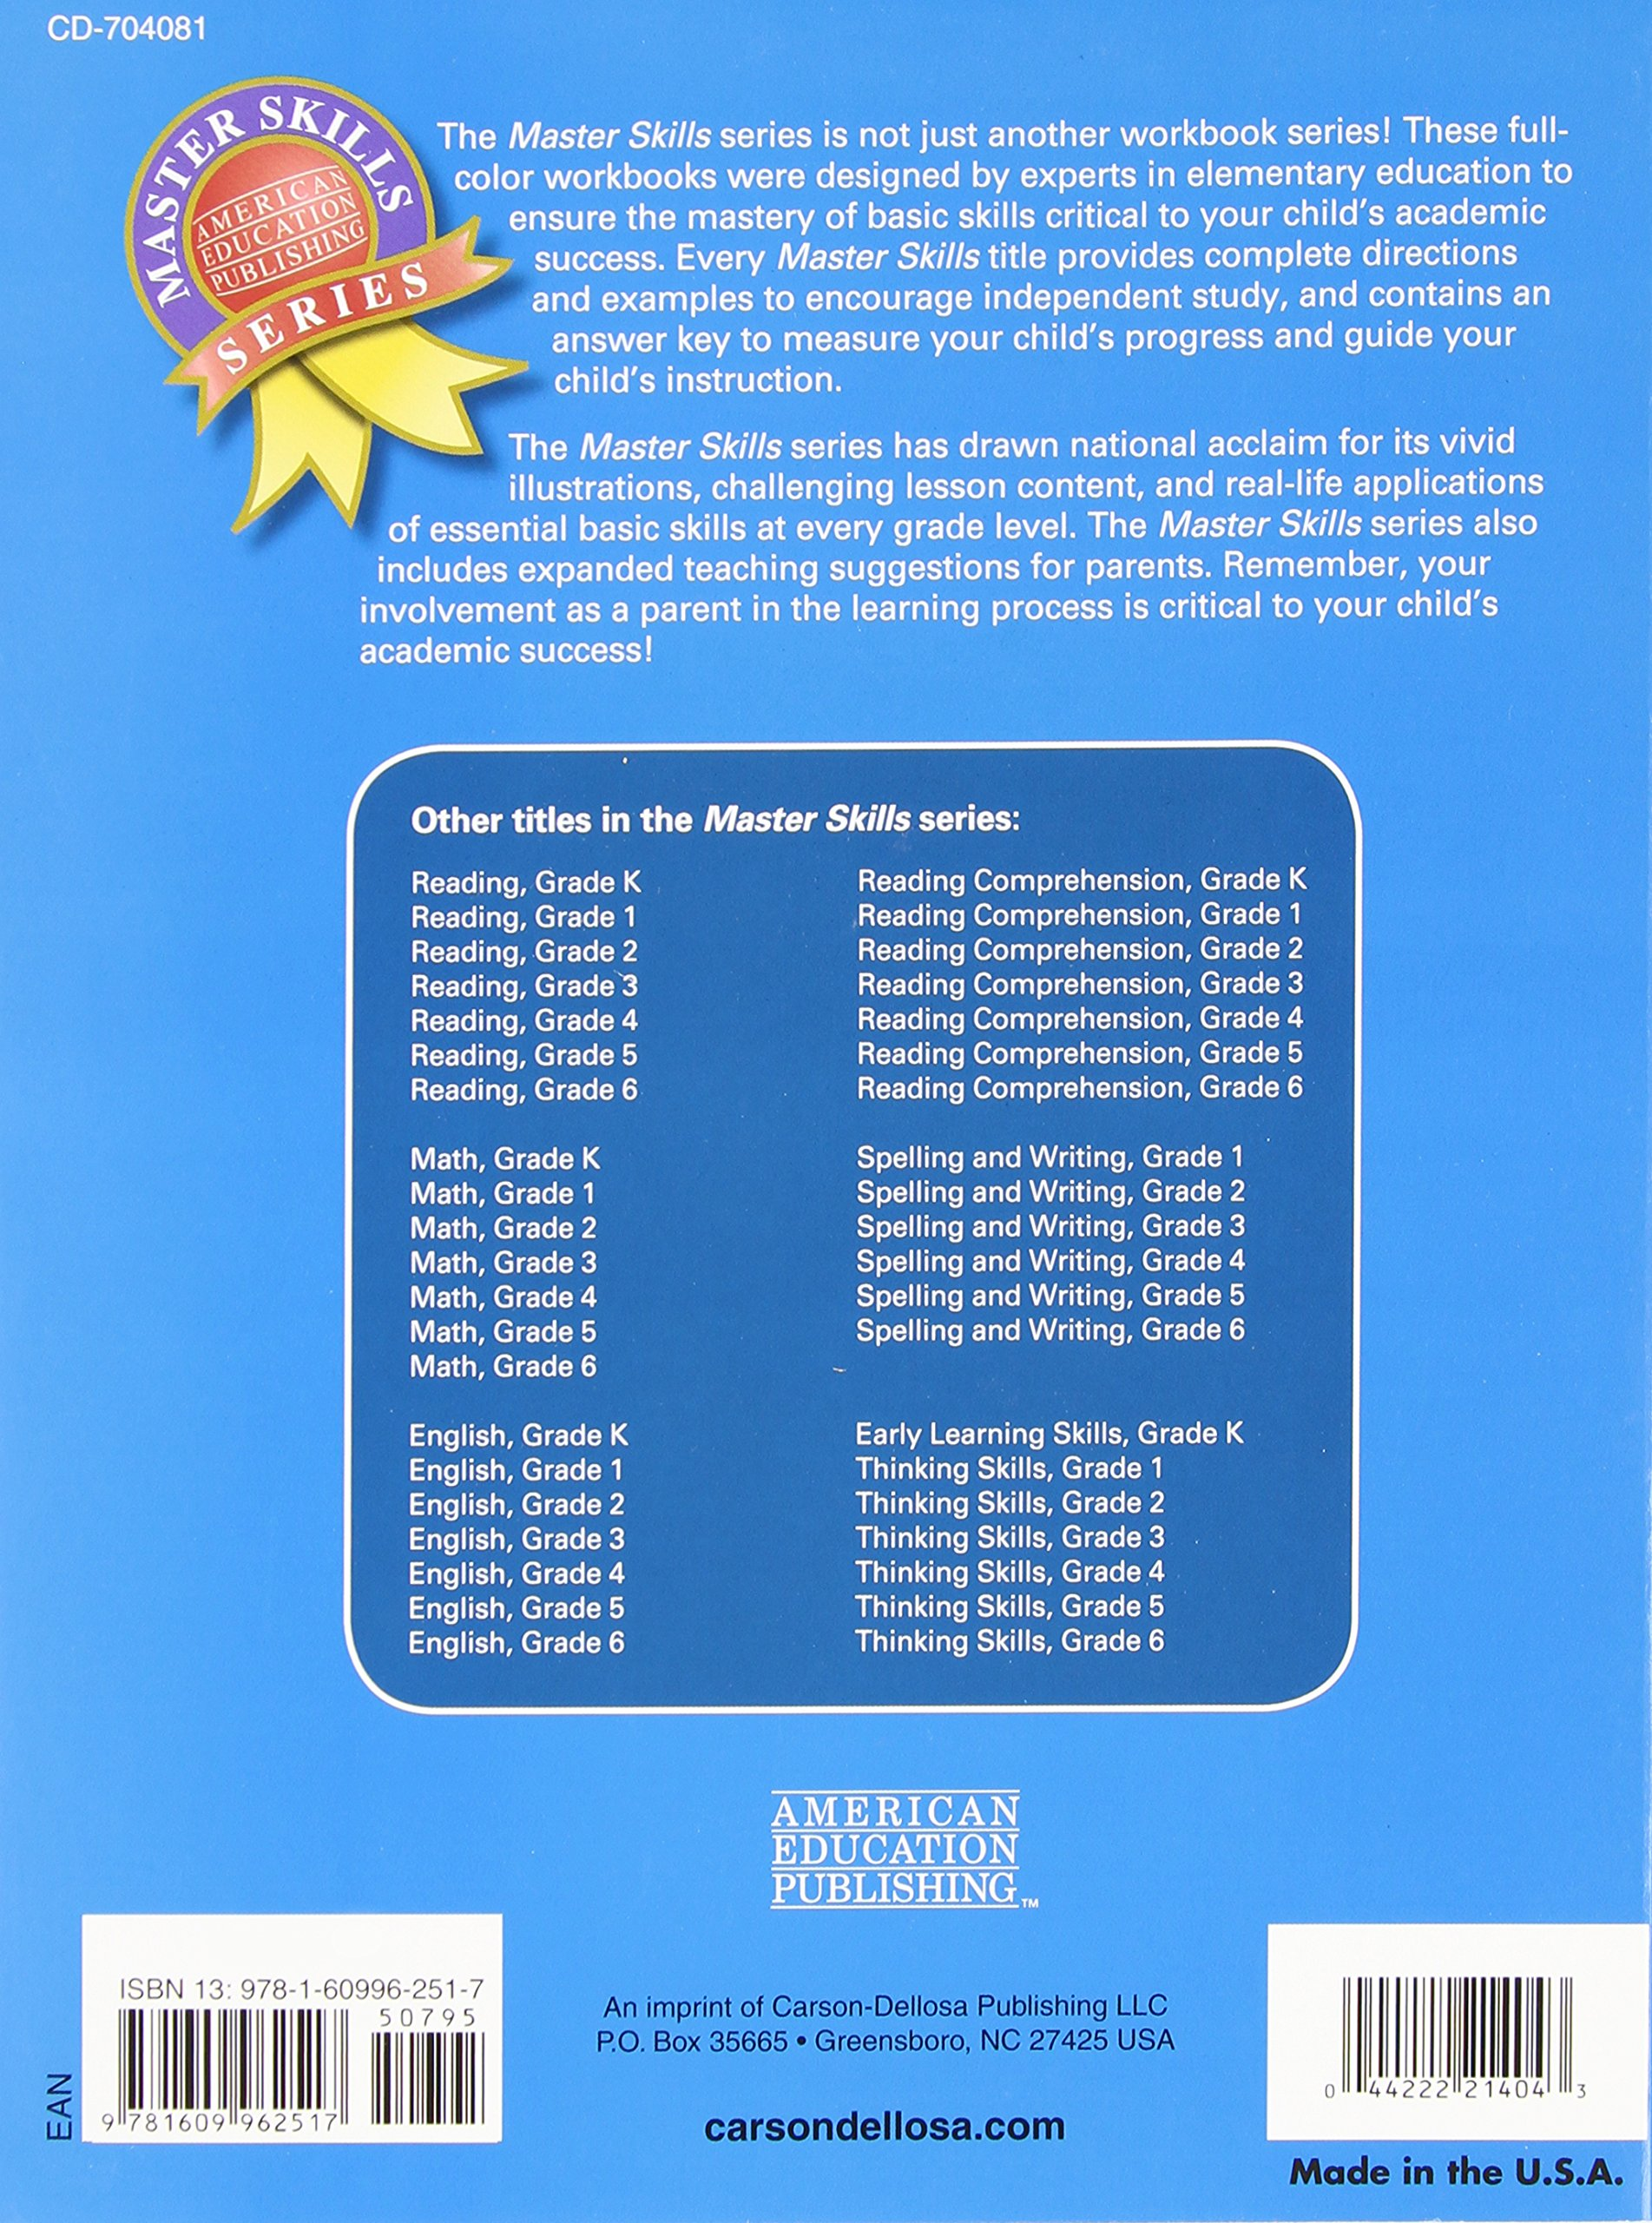 Amazon math grade 4 master skills 0044222214043 american amazon math grade 4 master skills 0044222214043 american education publishing books fandeluxe Choice Image